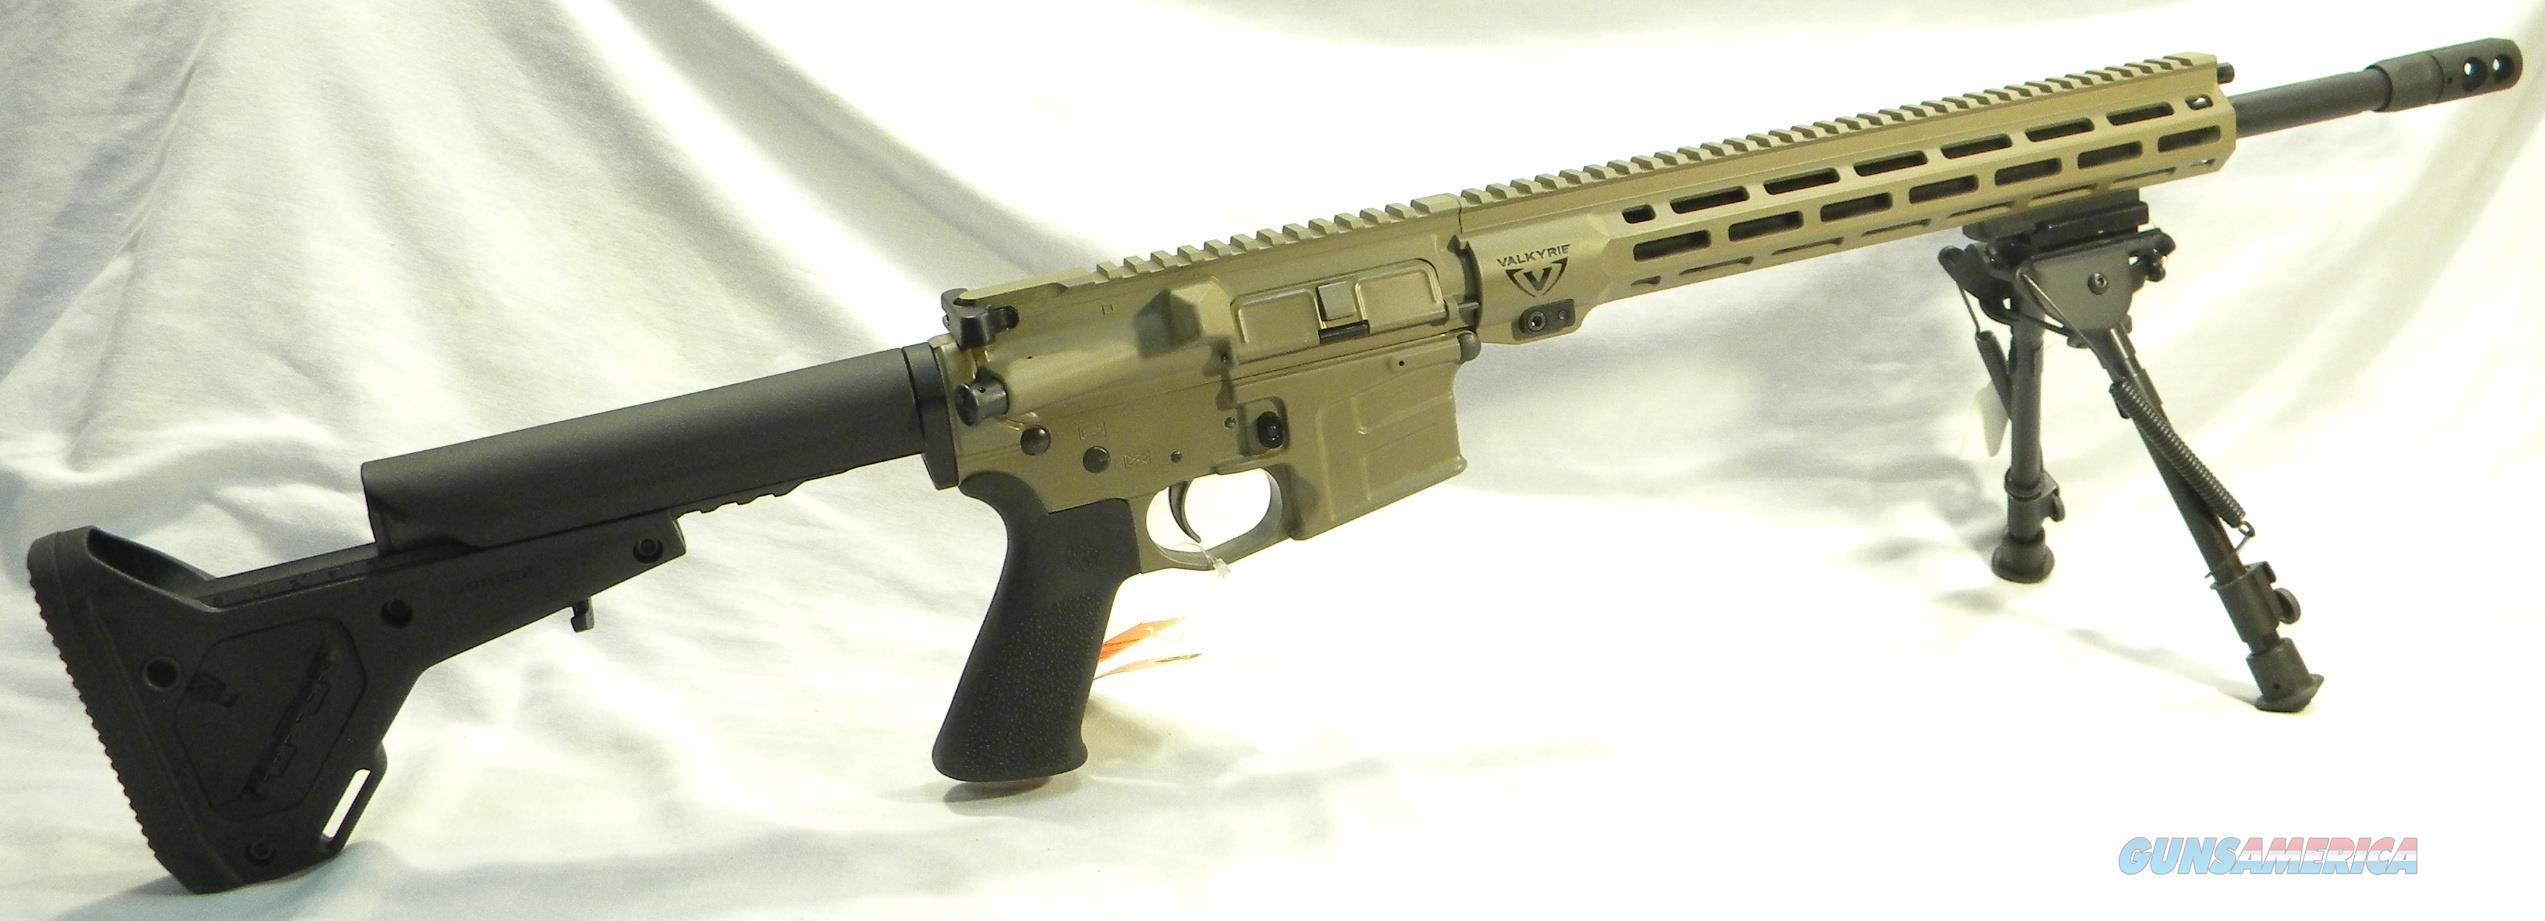 ".224 Valkyrie, Savage MSR-15 Valkyrie ""Elite"" Semi-Automatic Rifle  Guns > Rifles > Savage Rifles > Savage MSR"